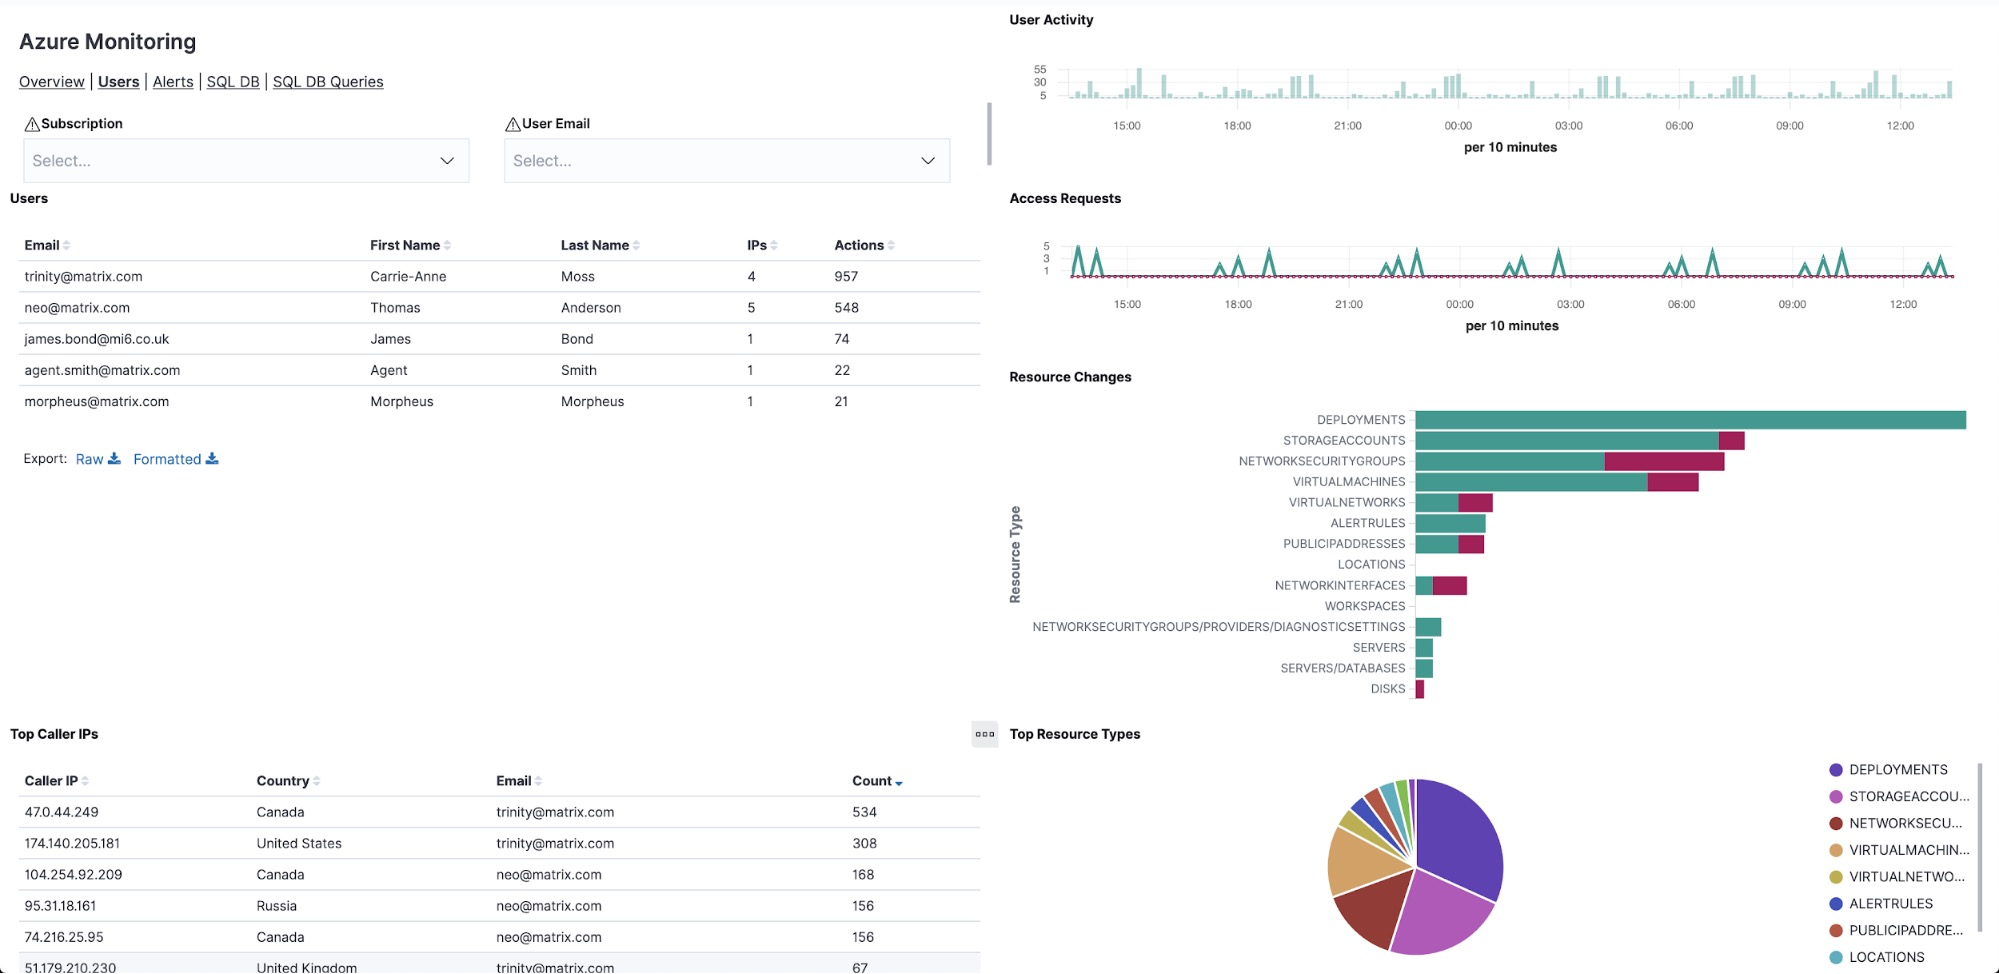 Prebuilt Azure monitoring dashboard in Kibana